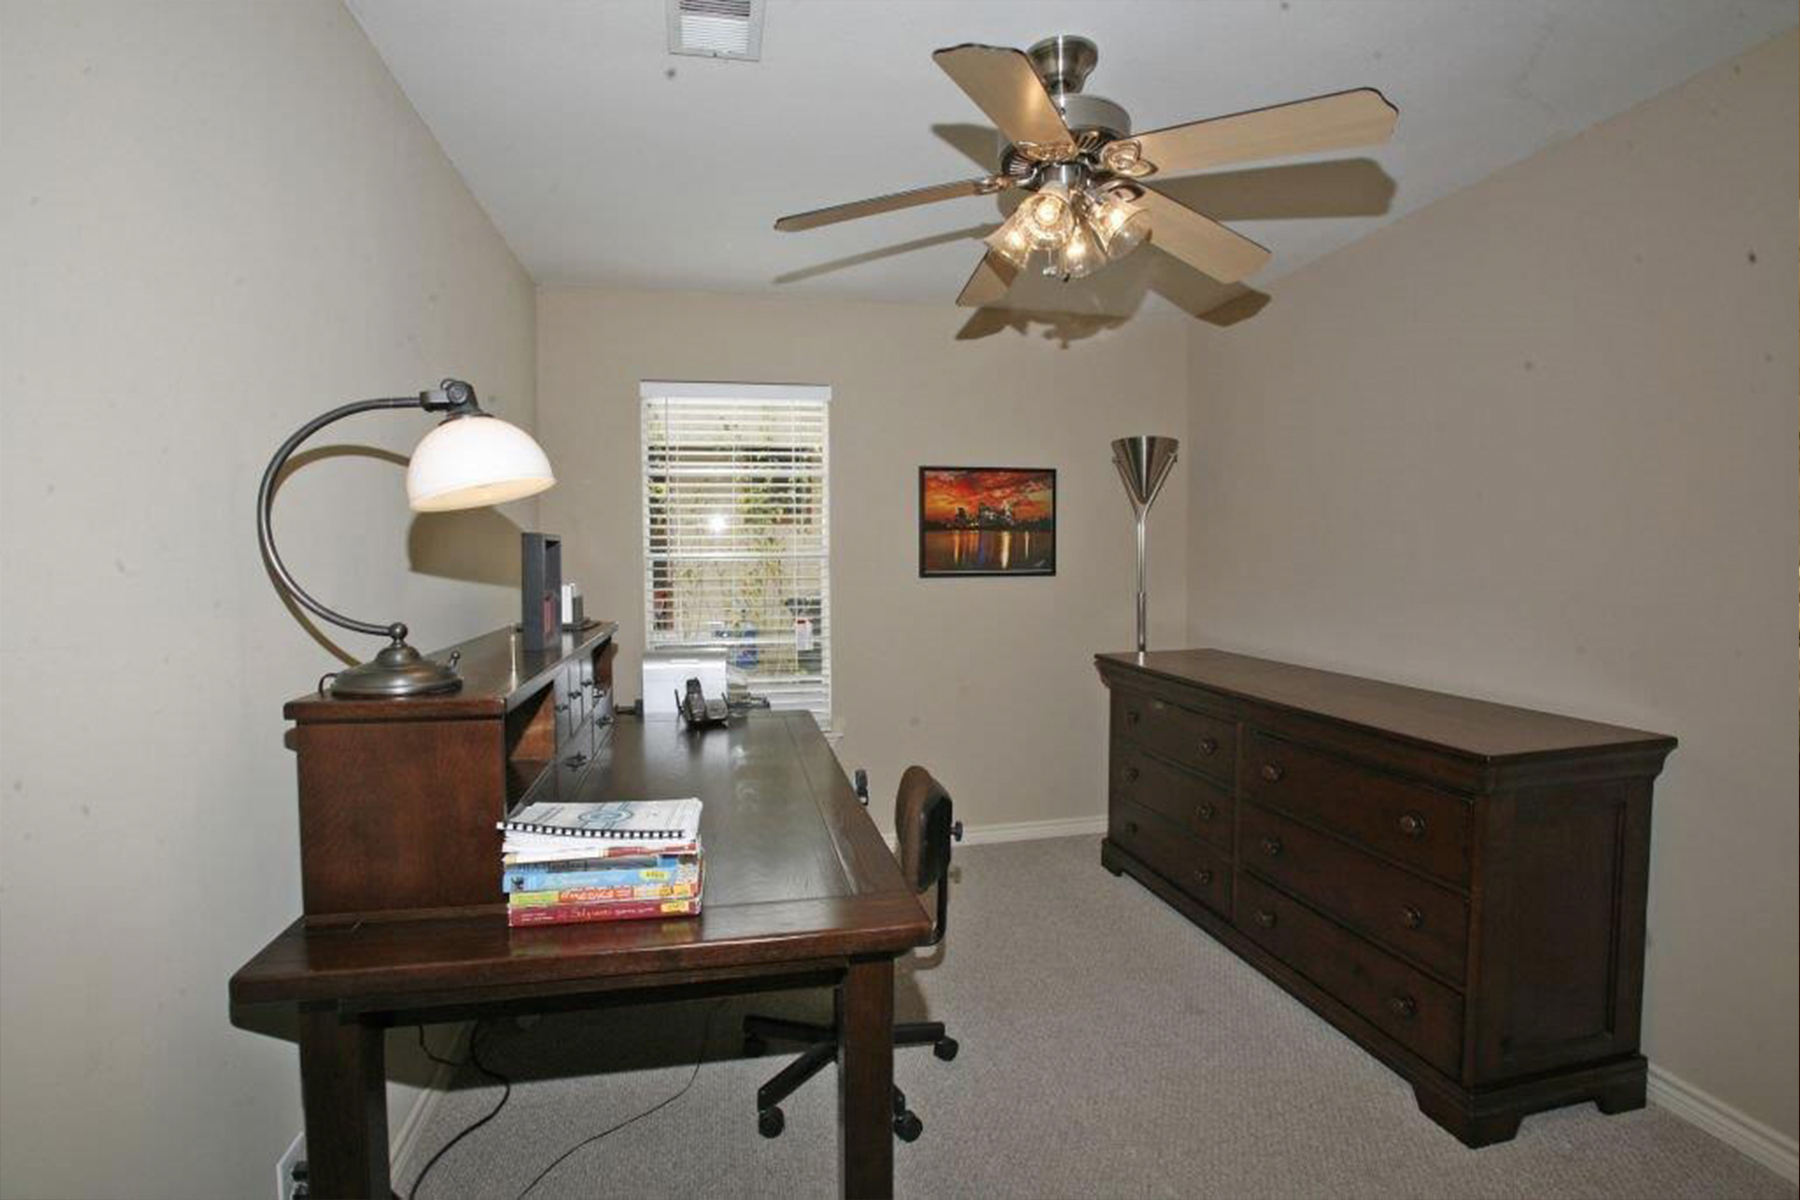 Additional photo for property listing at 2700 Friar Tuck Ln 2700 Friar Tuck Ln Austin, Texas 78704 Estados Unidos